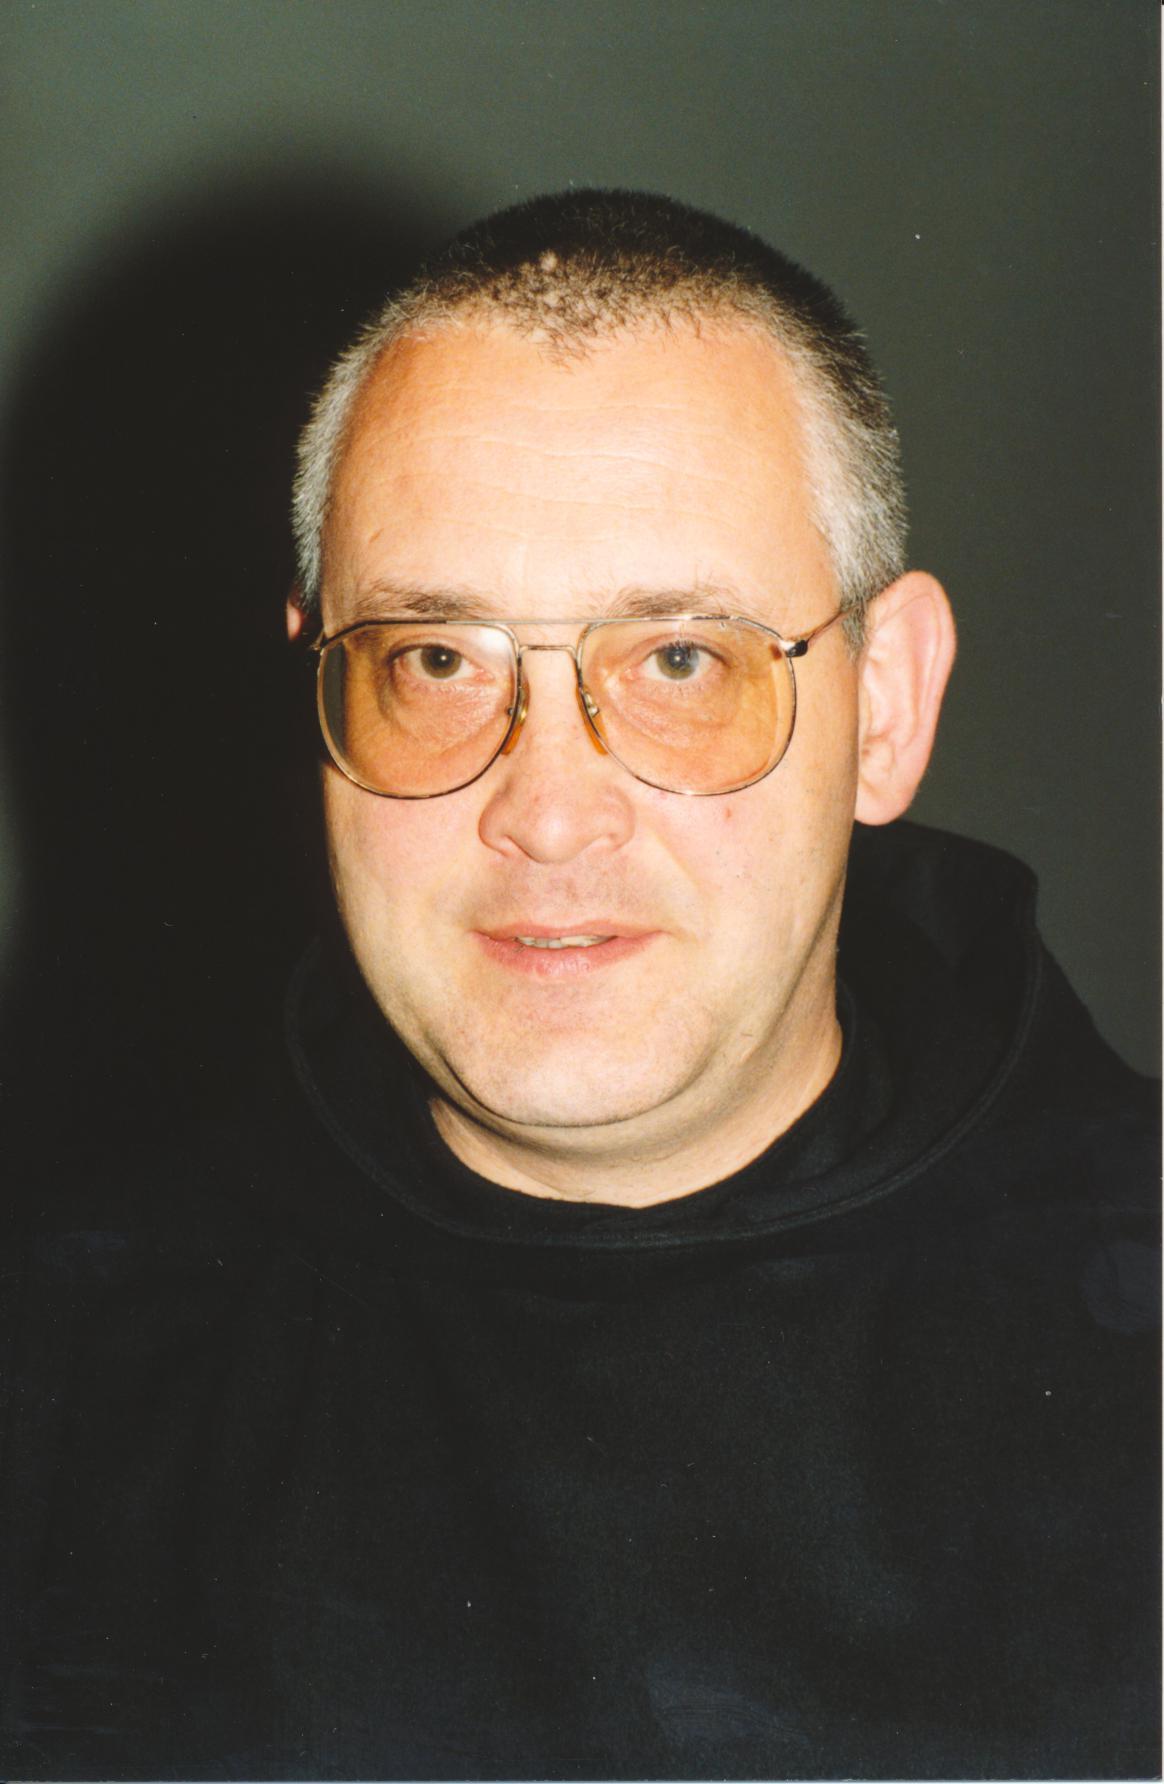 XV. Imago Mundi-Kongress 1995, Innsbruck, Drs. Drs. P. Johannes M. Touw